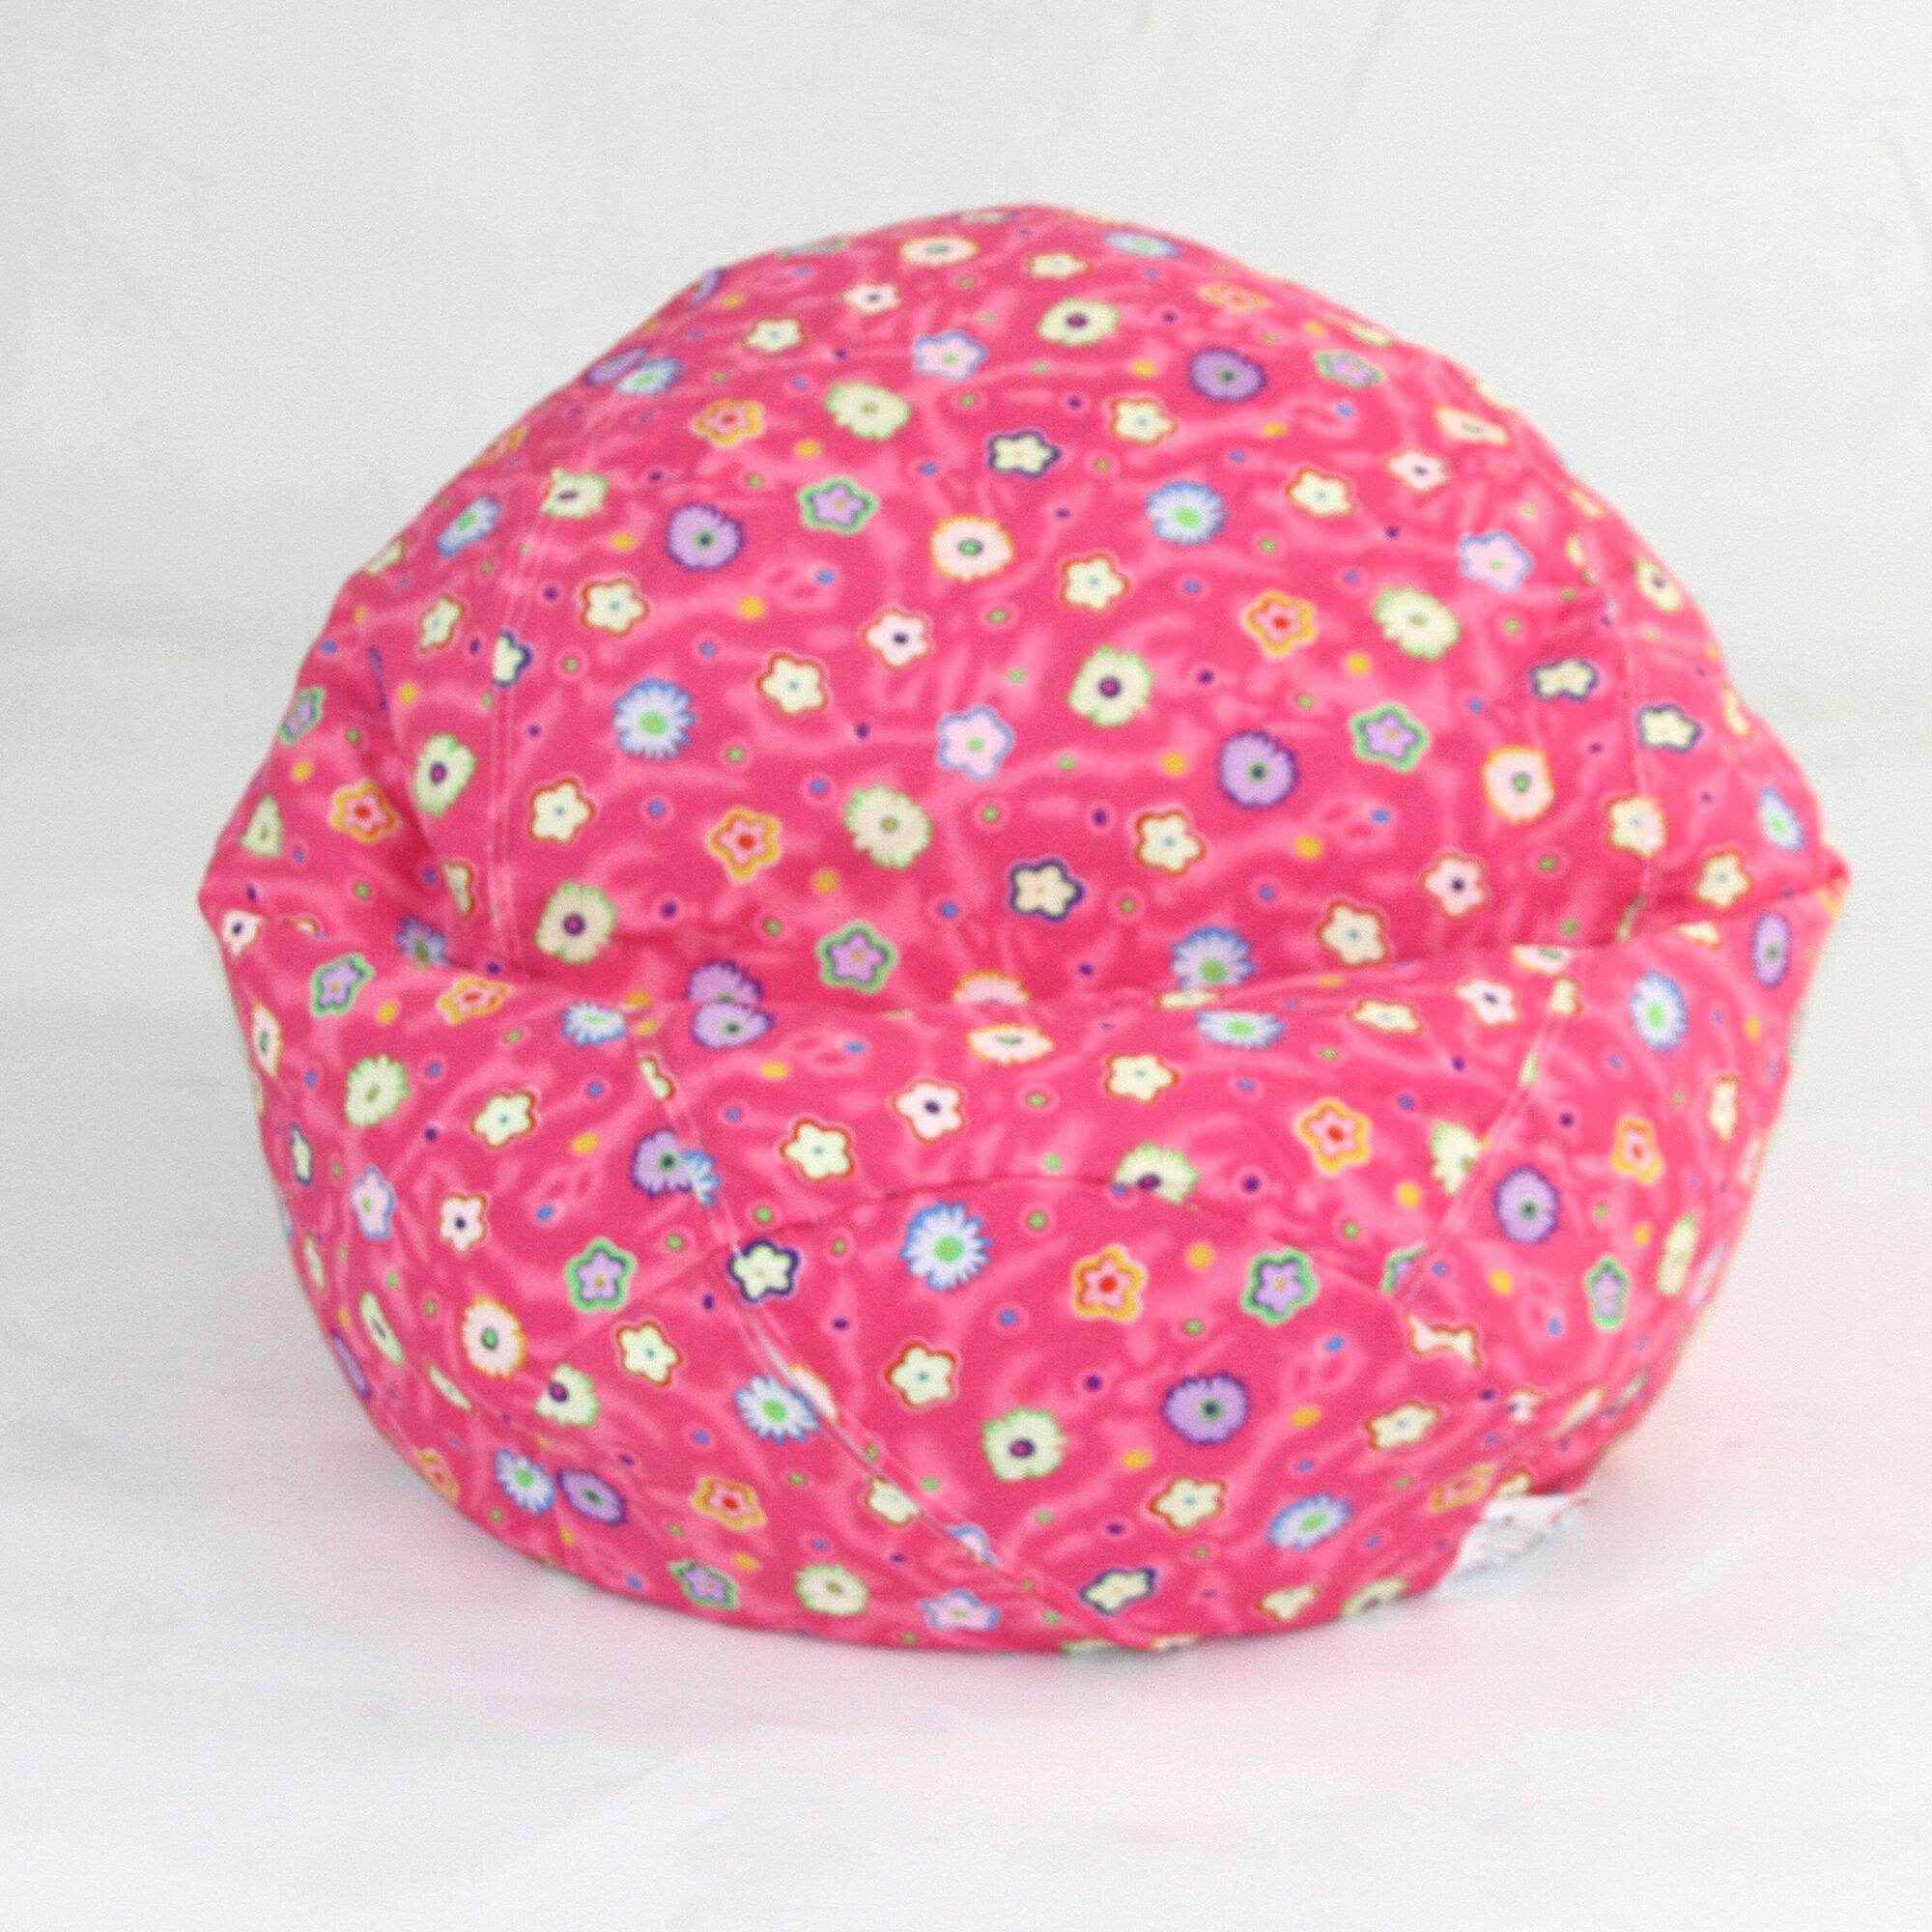 Awe Inspiring Details About Zoomie Kids Floral Bean Bag Chair Beatyapartments Chair Design Images Beatyapartmentscom